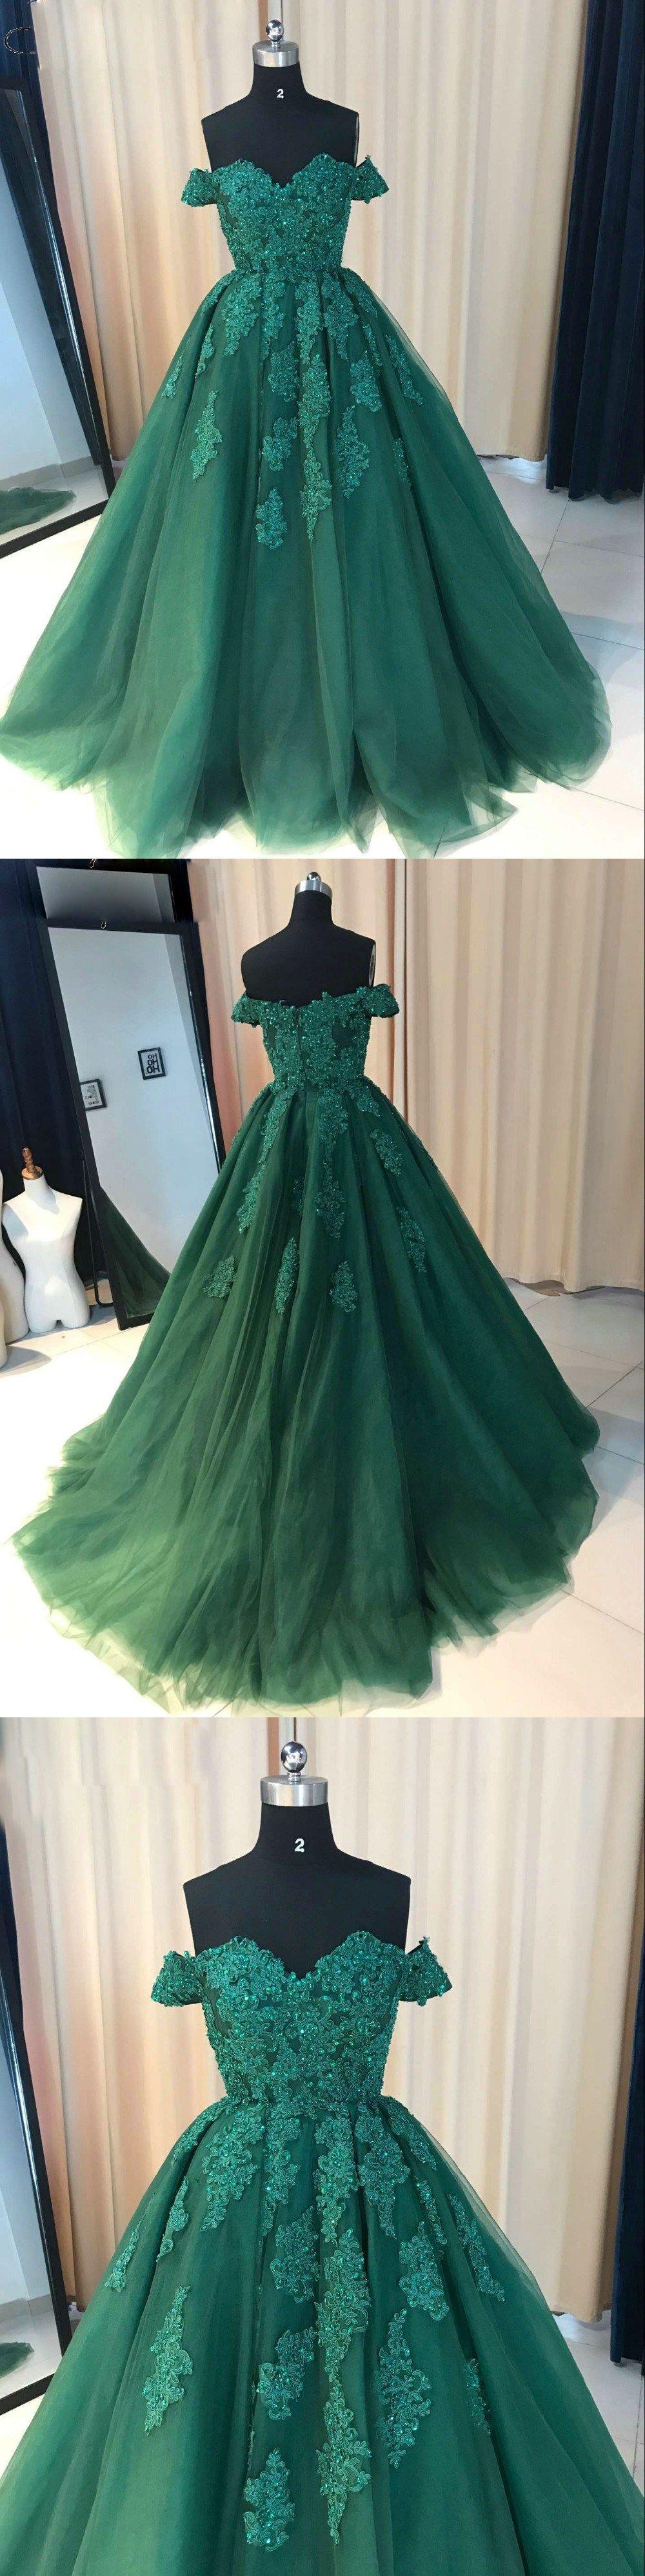 Prom dressoffshoulder prom dress longlace prom dress plus size